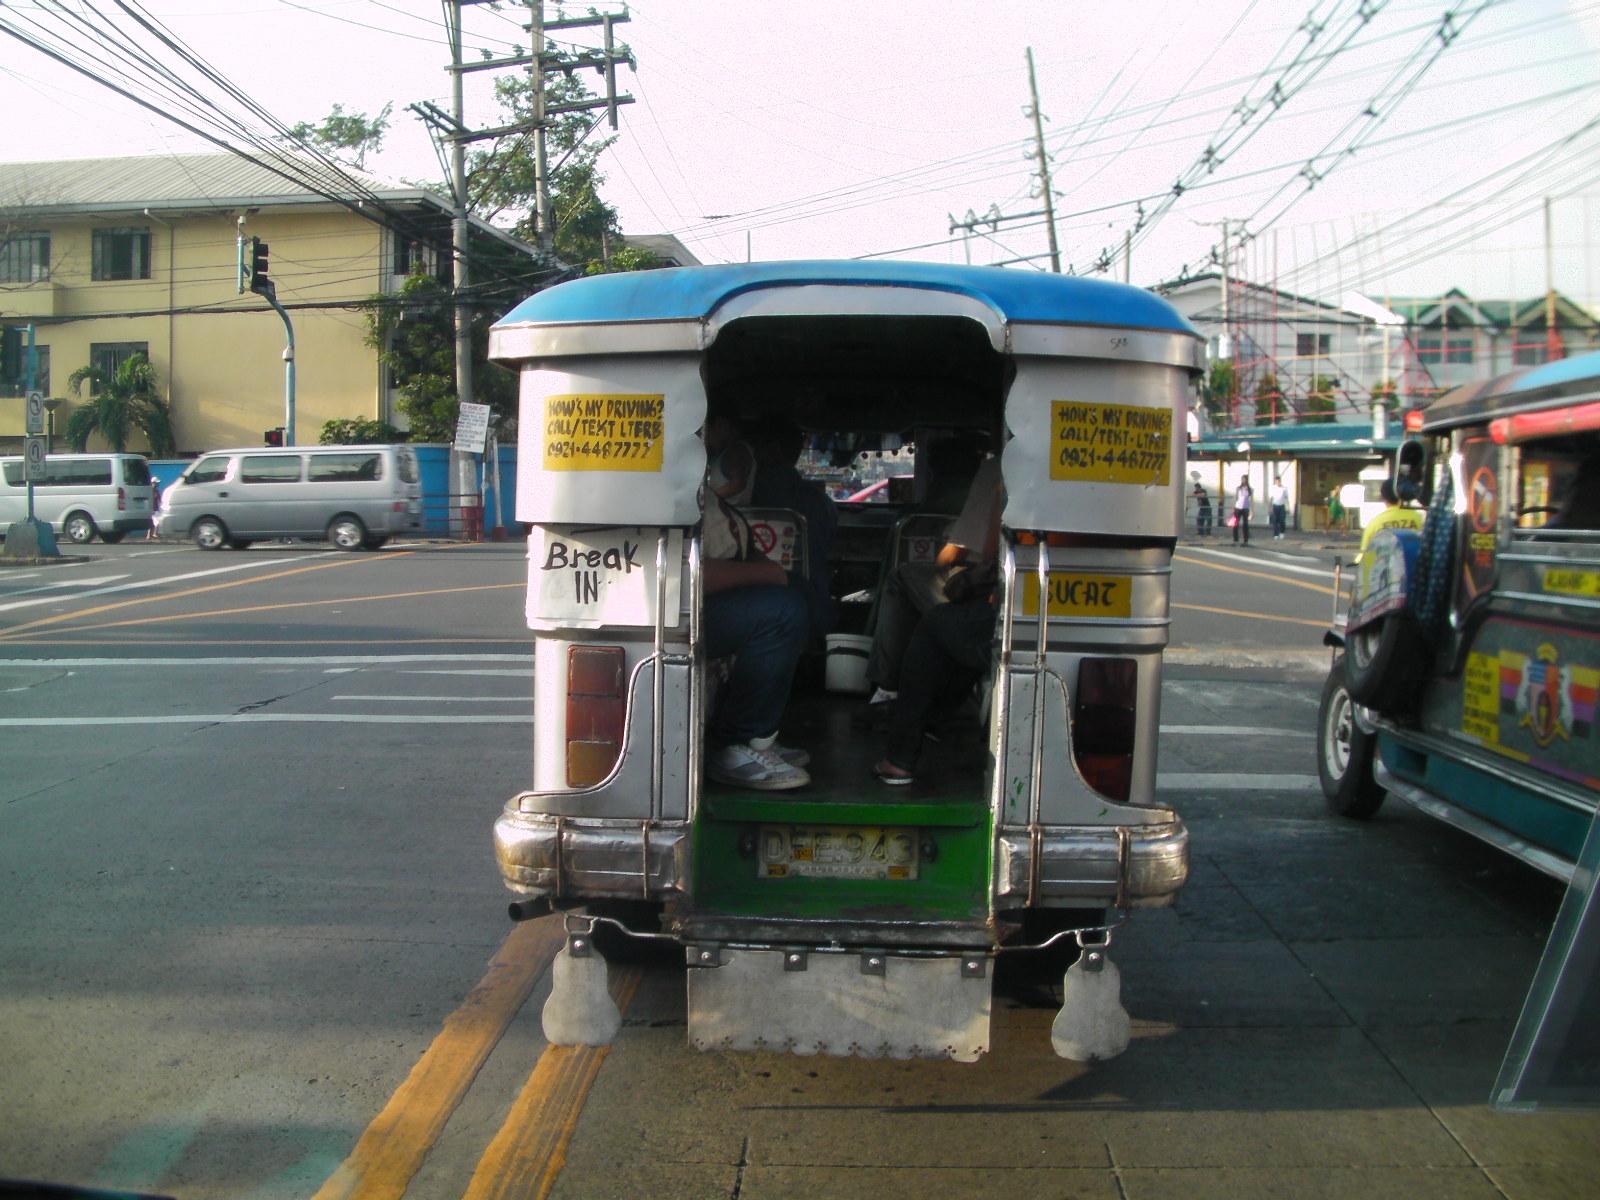 My Corner of Japan: The Philippines